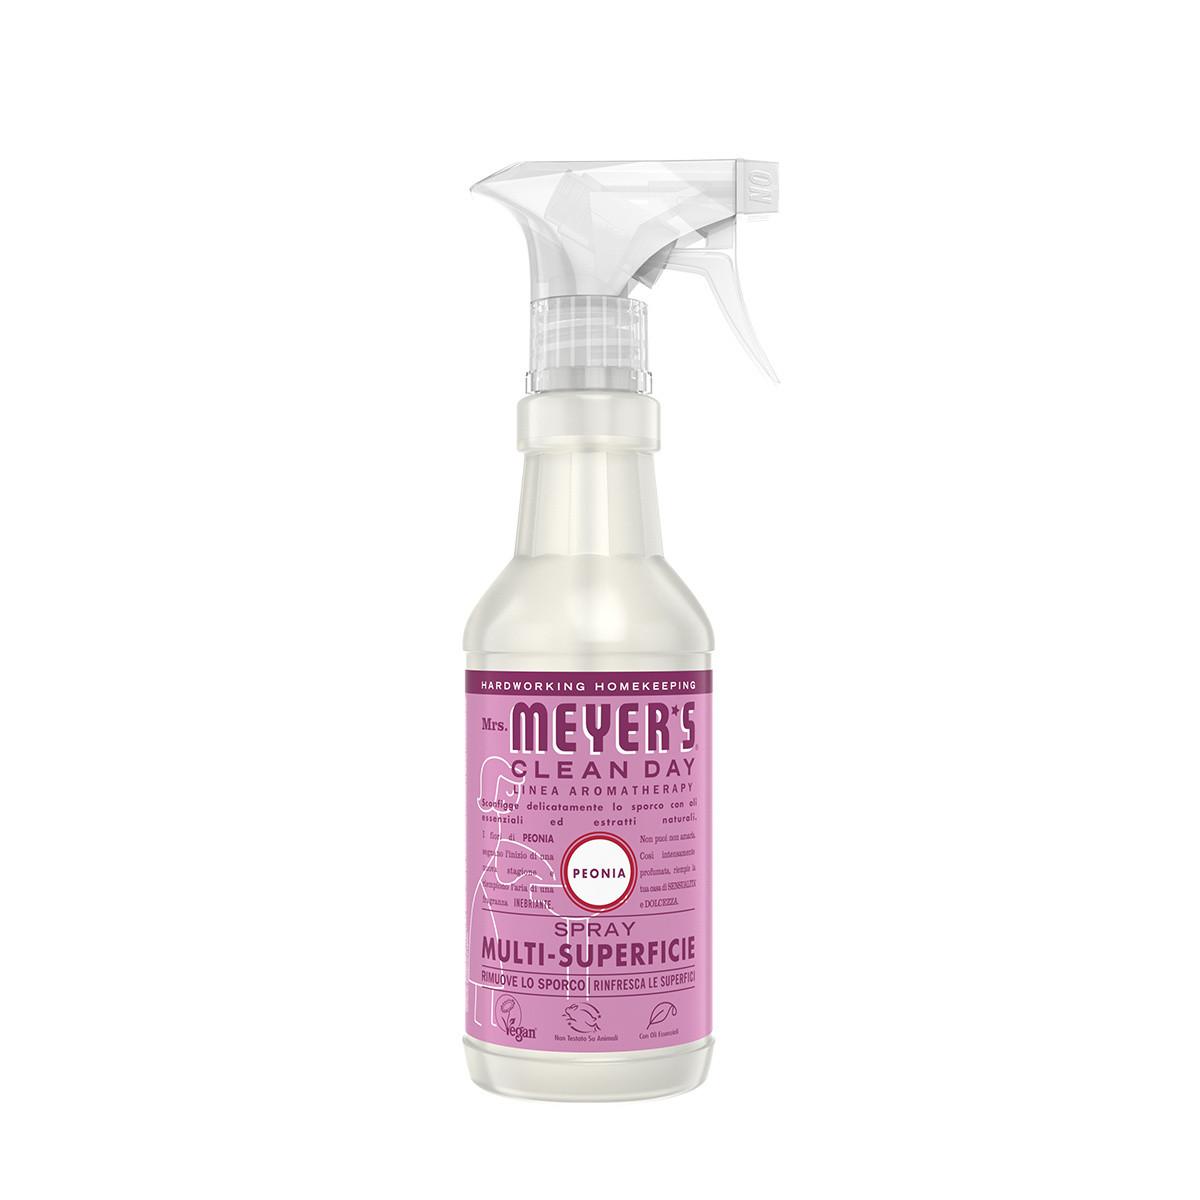 Spray detergente multi-superficie profumo di peonia 473ml, Rosa, large image number 0